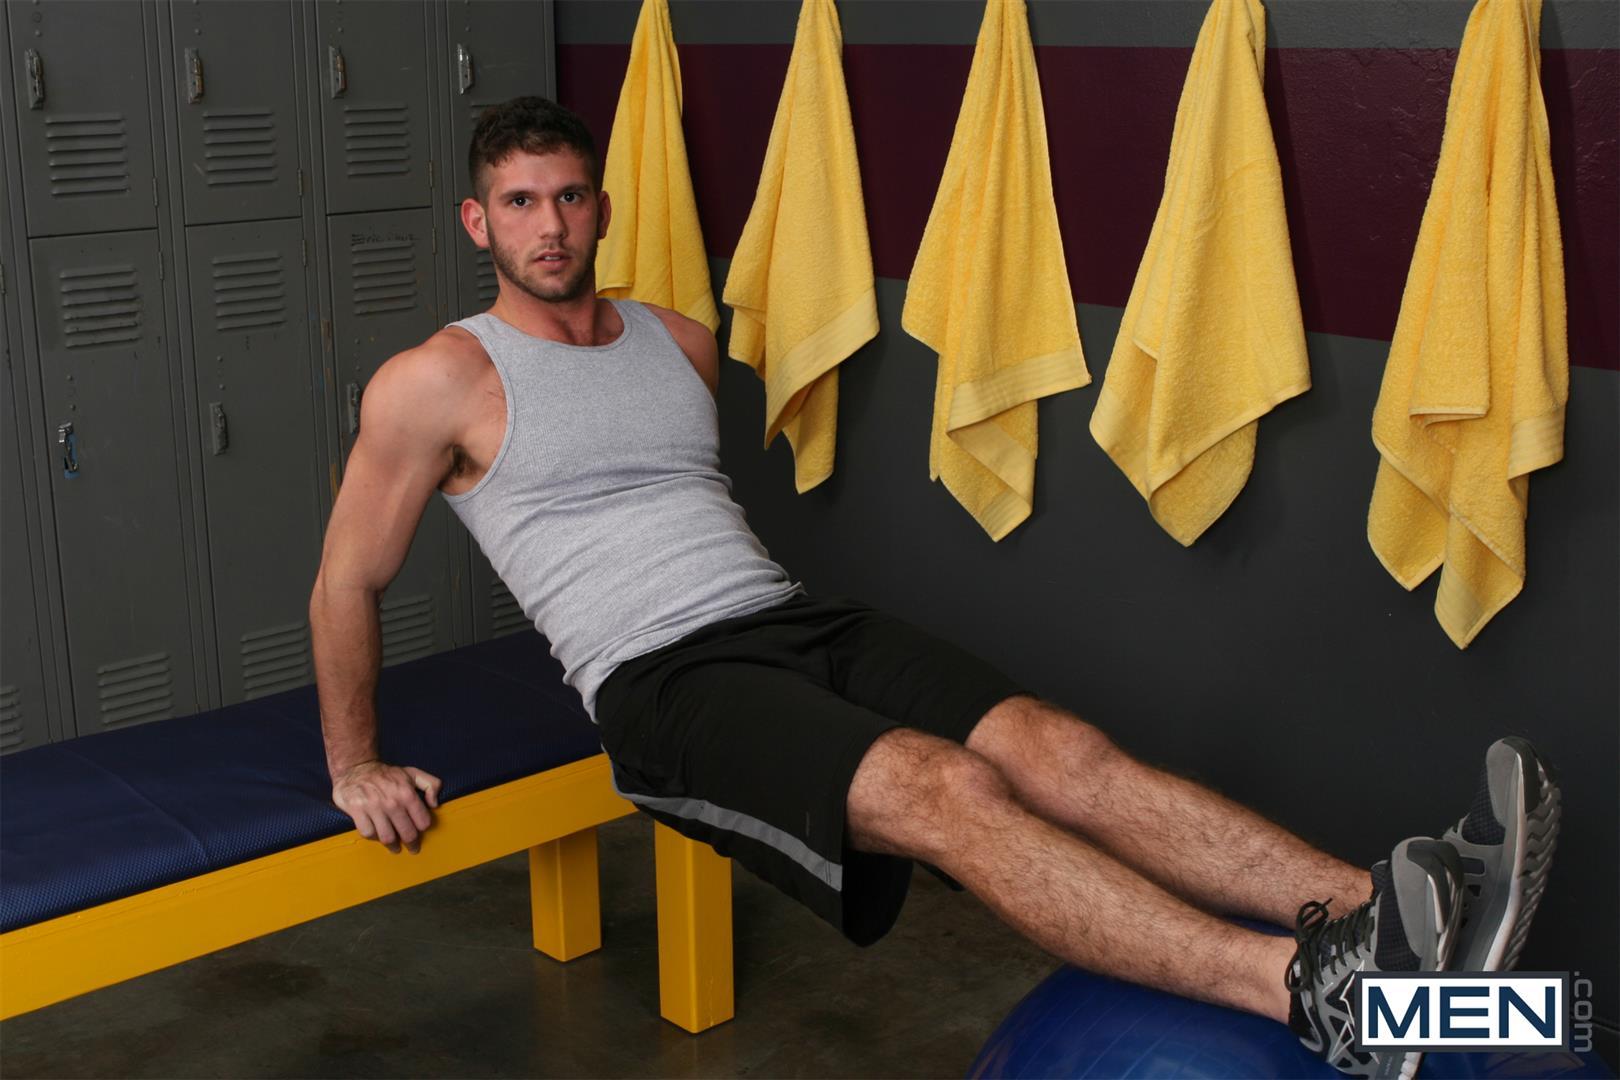 Soccer gay sex underwear check him 2